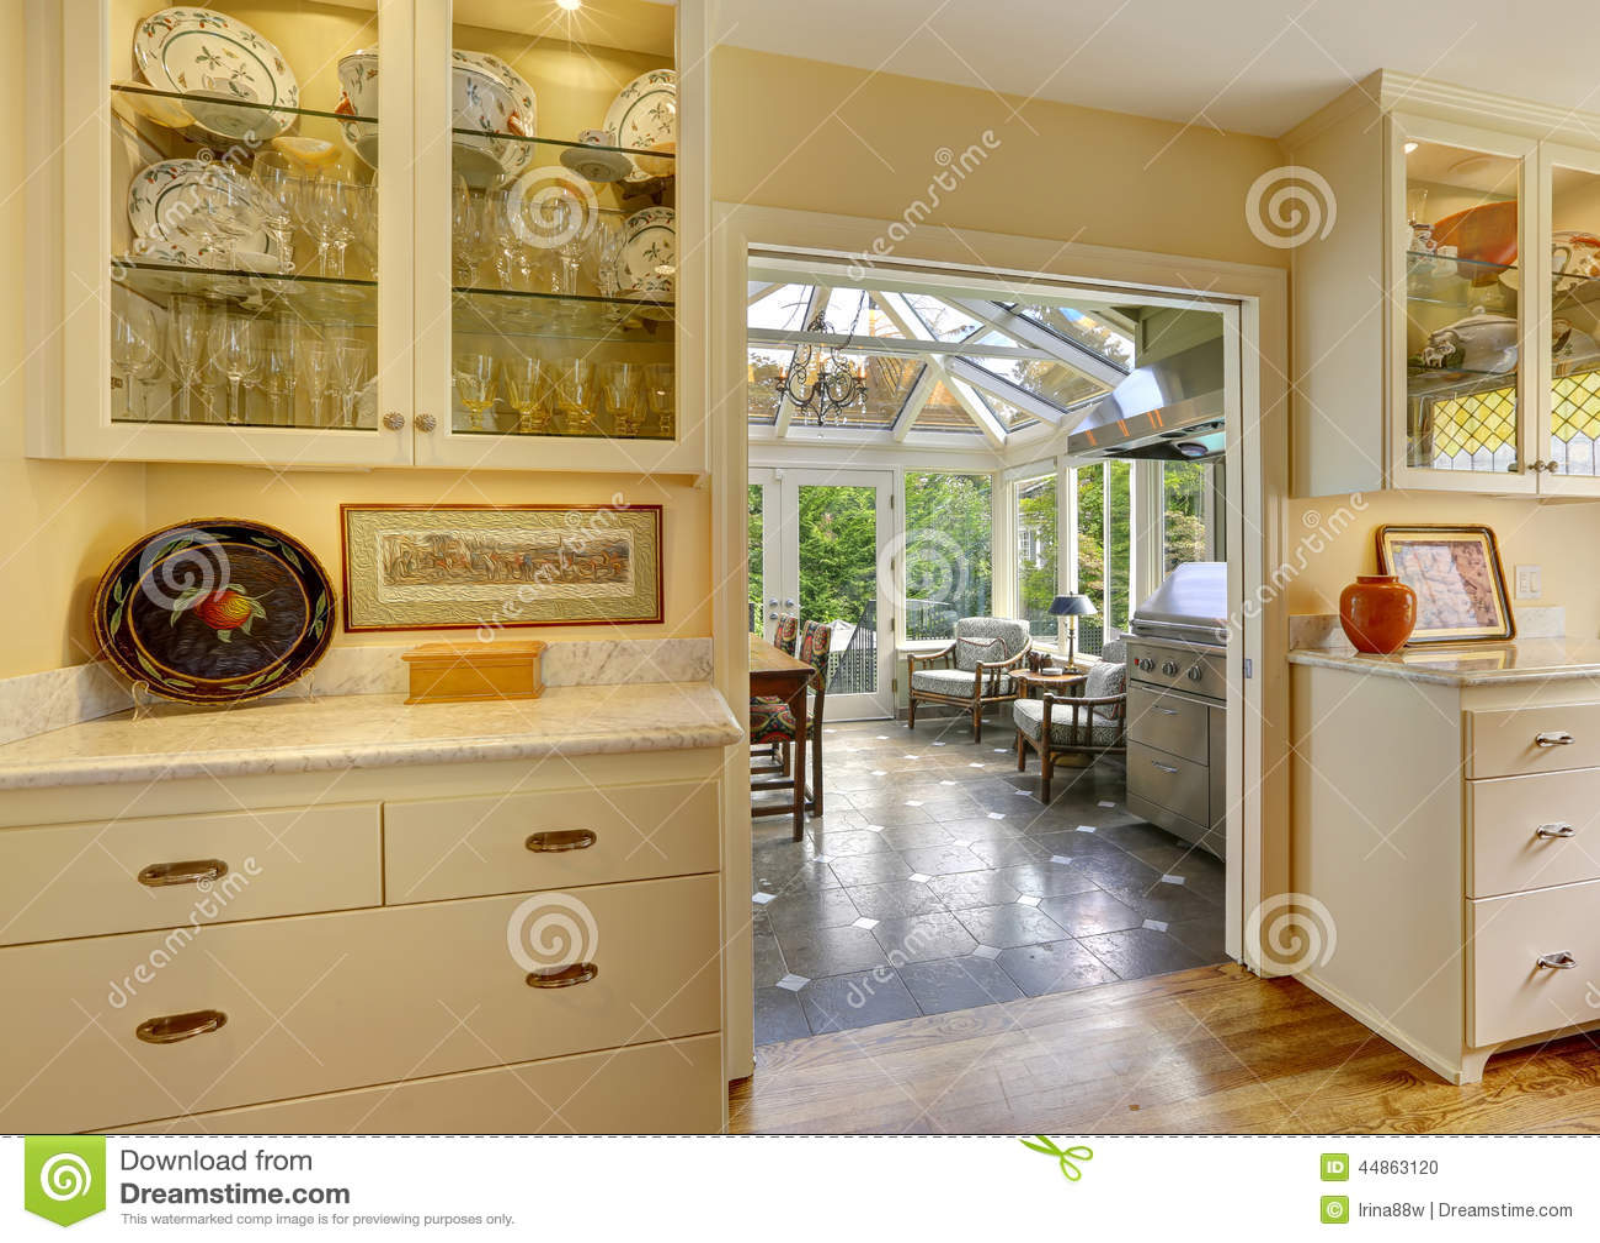 patio kitchen outdoor design plans 有出口的厨房室对在日光浴室的露台区域库存照片 图片包括有里面 建筑师 有出口的厨房室对在日光浴室的露台区域